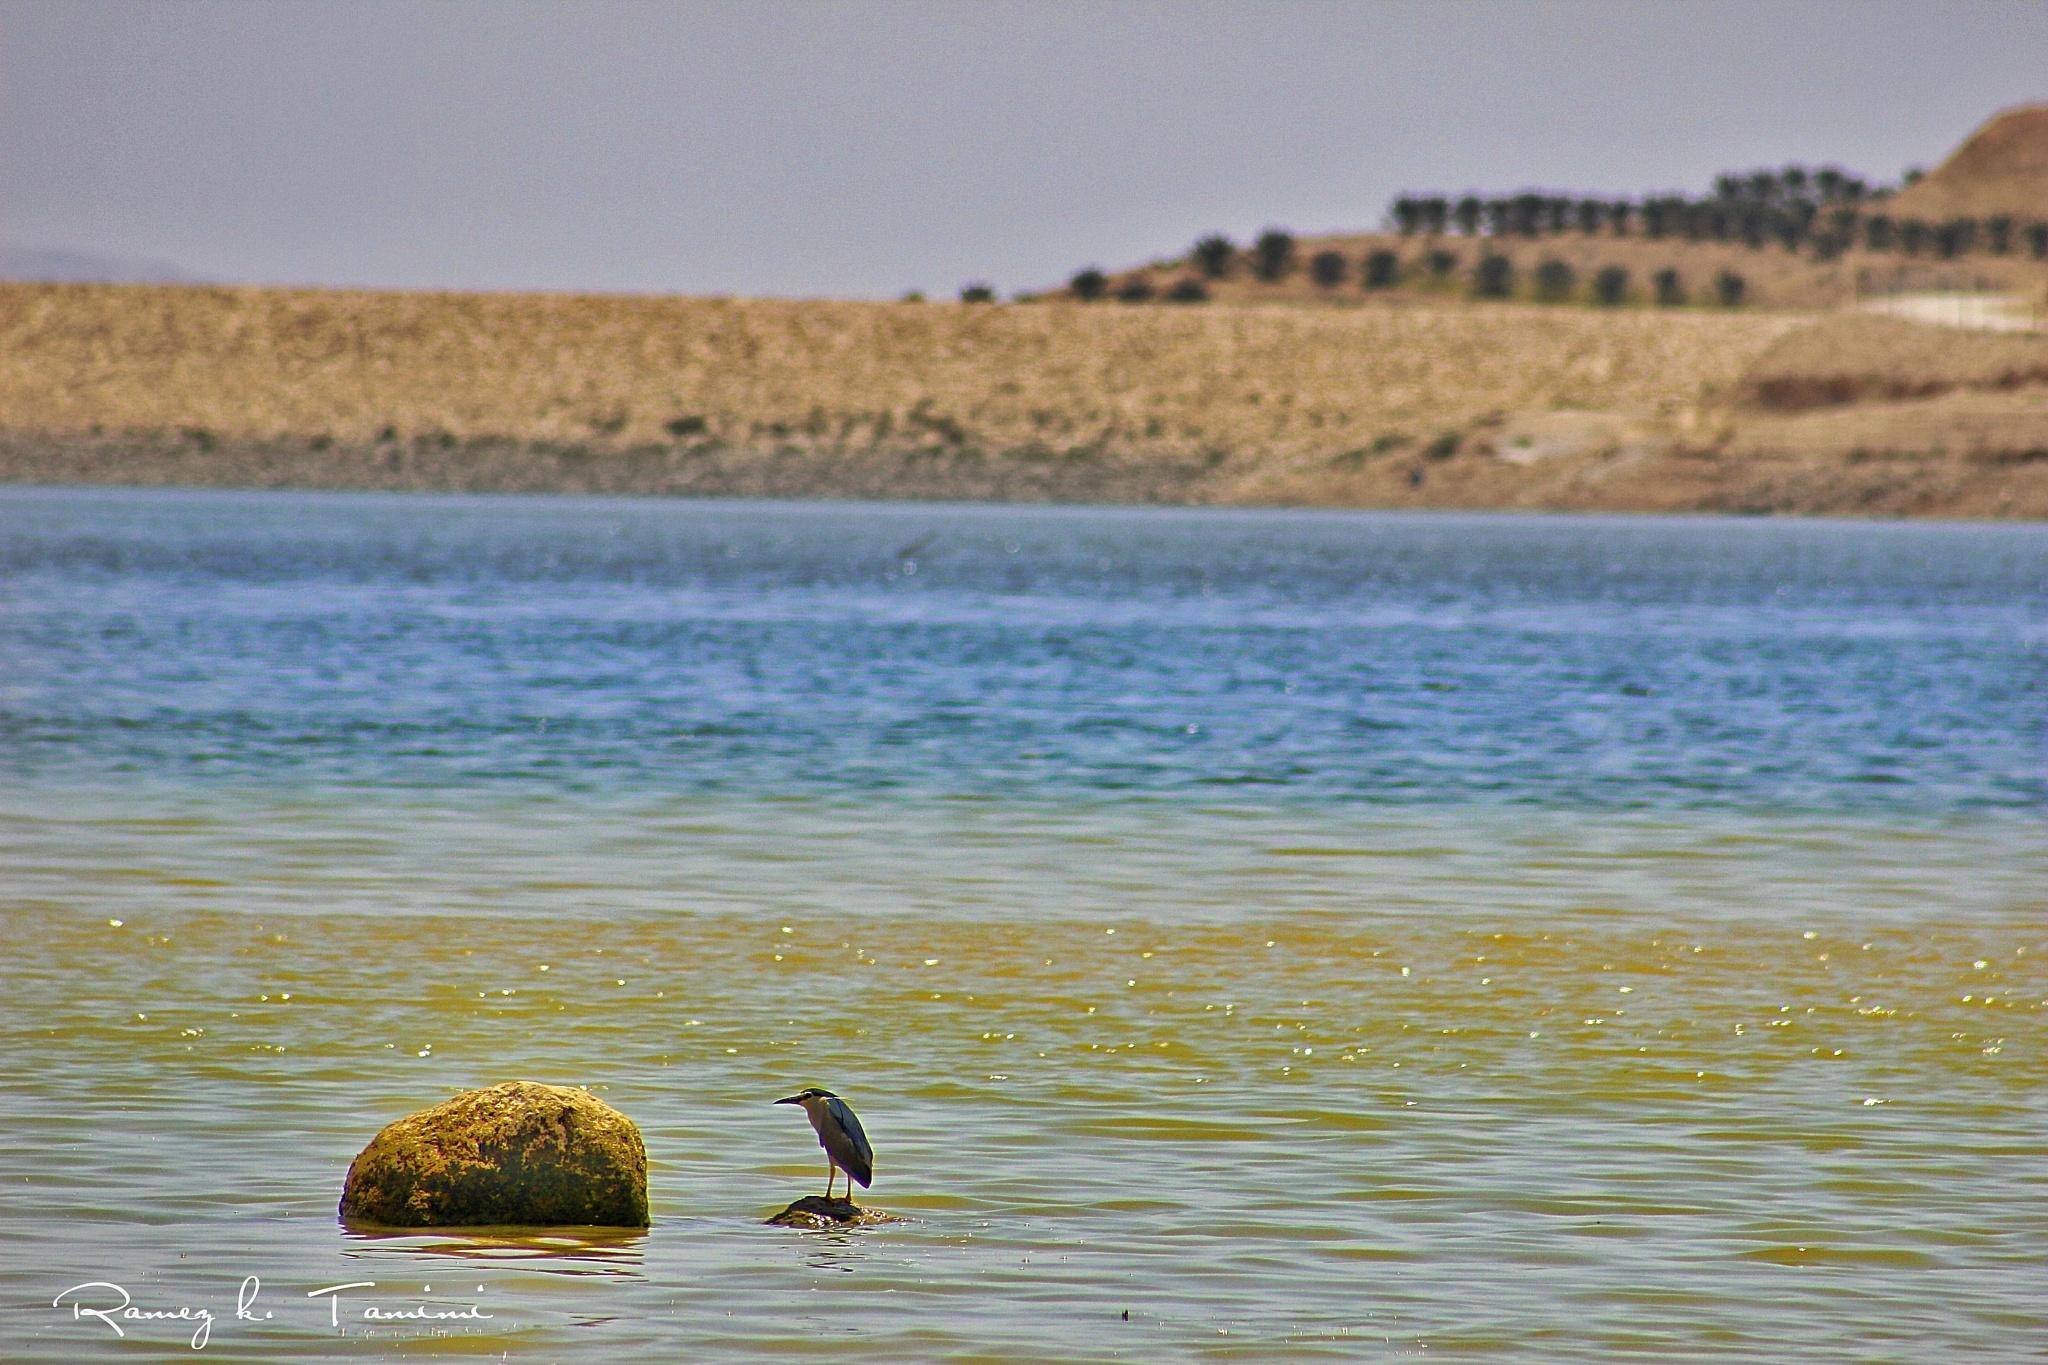 Dam @jordan valley by Ramez k. Tamimi